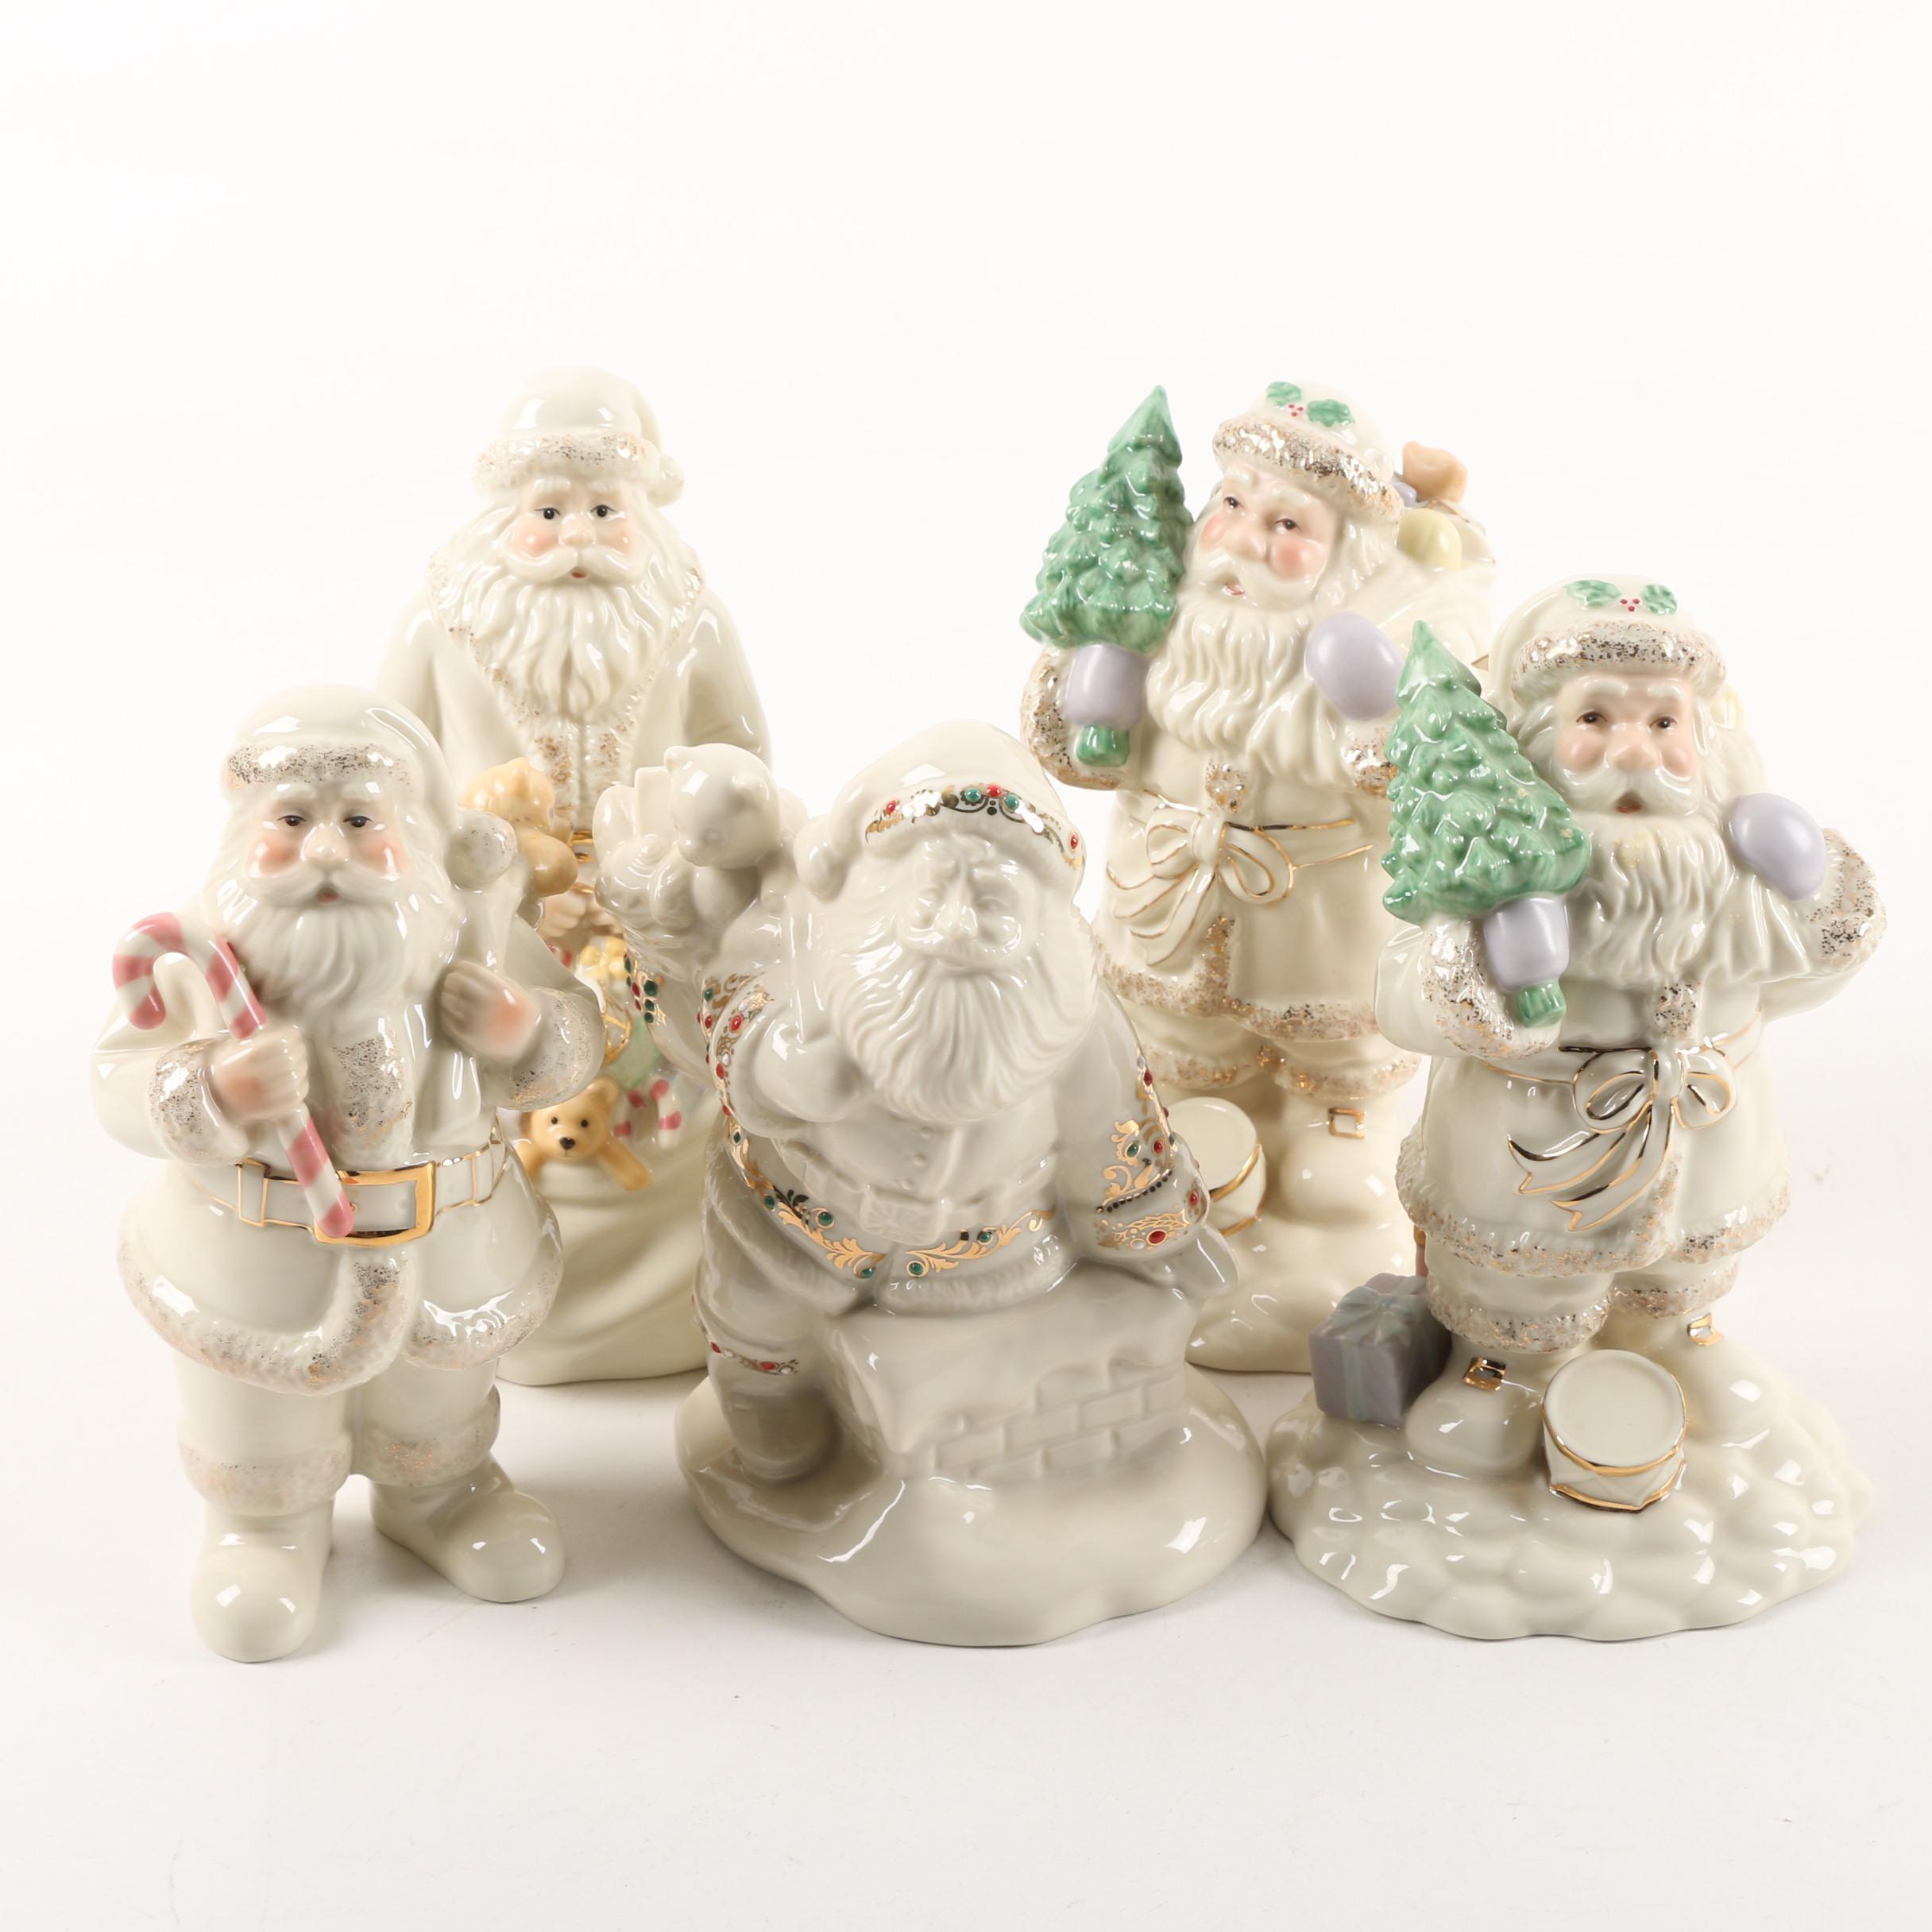 Lenox Handcrafted Porcelain Santa Figurines